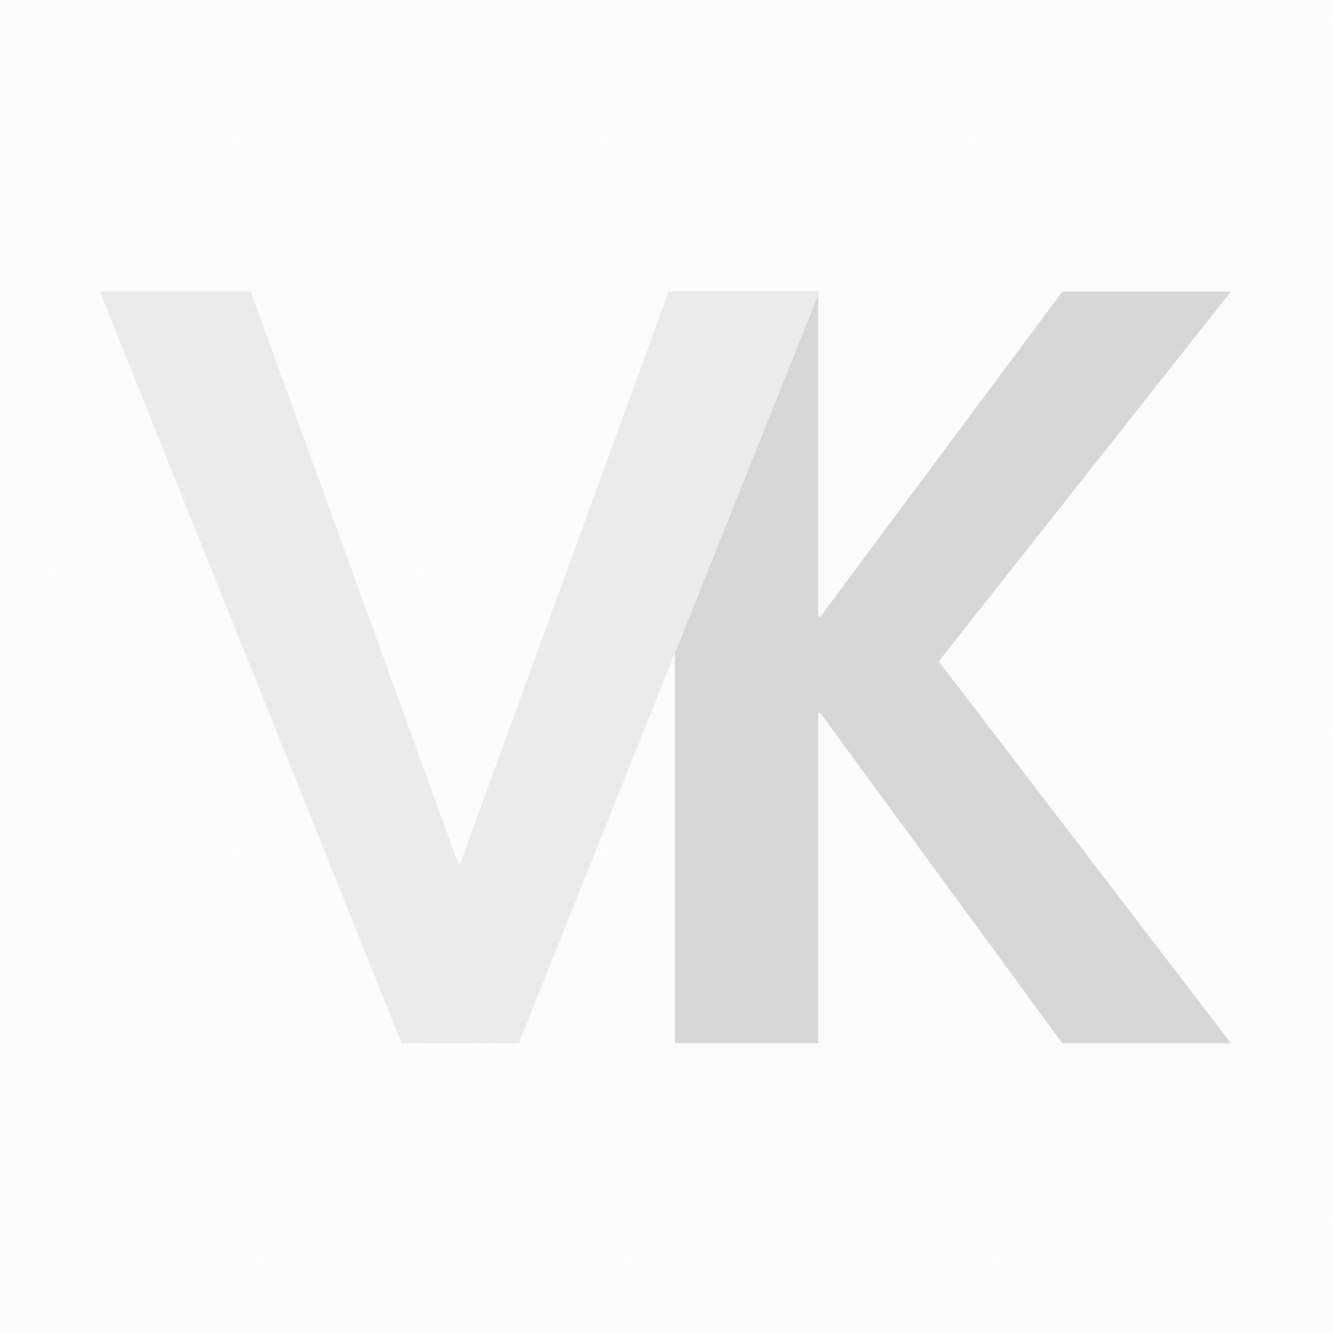 L'Oréal Diarichesse en Dialight Series Kleurenkaart